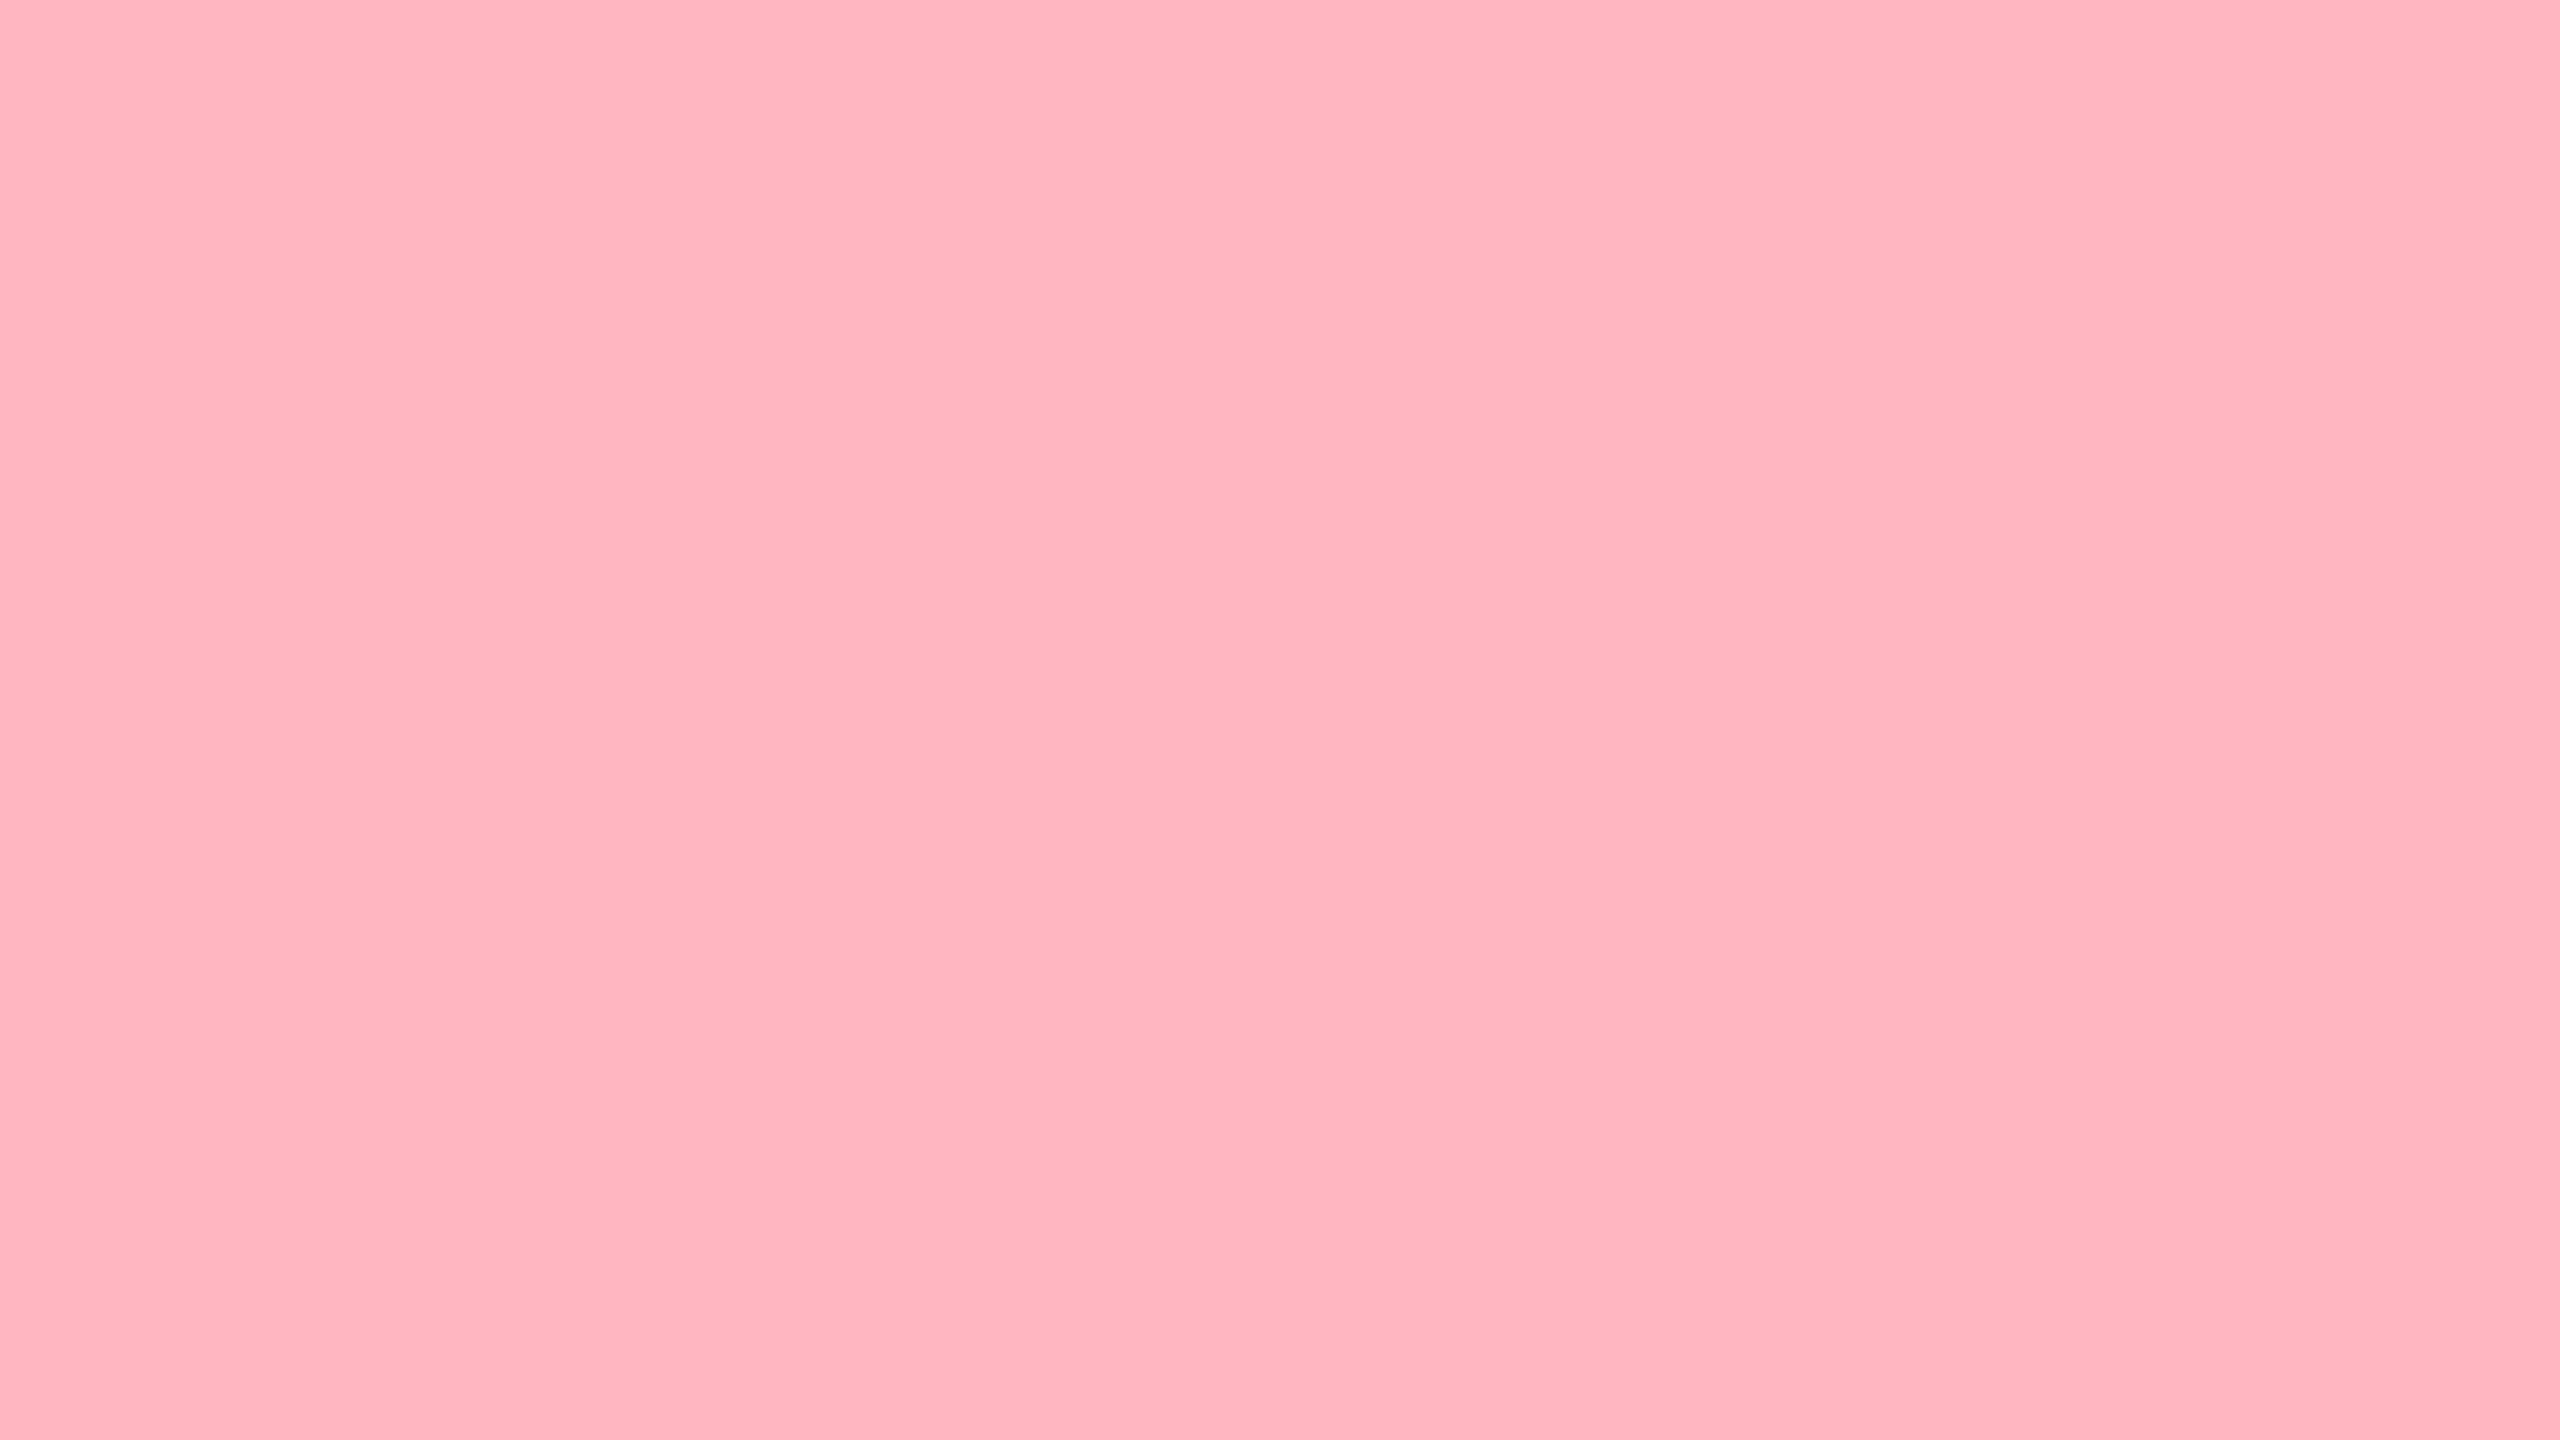 Tumblr Backgrounds Light Pink HD Wallpapers on picsfaircom 2560x1440